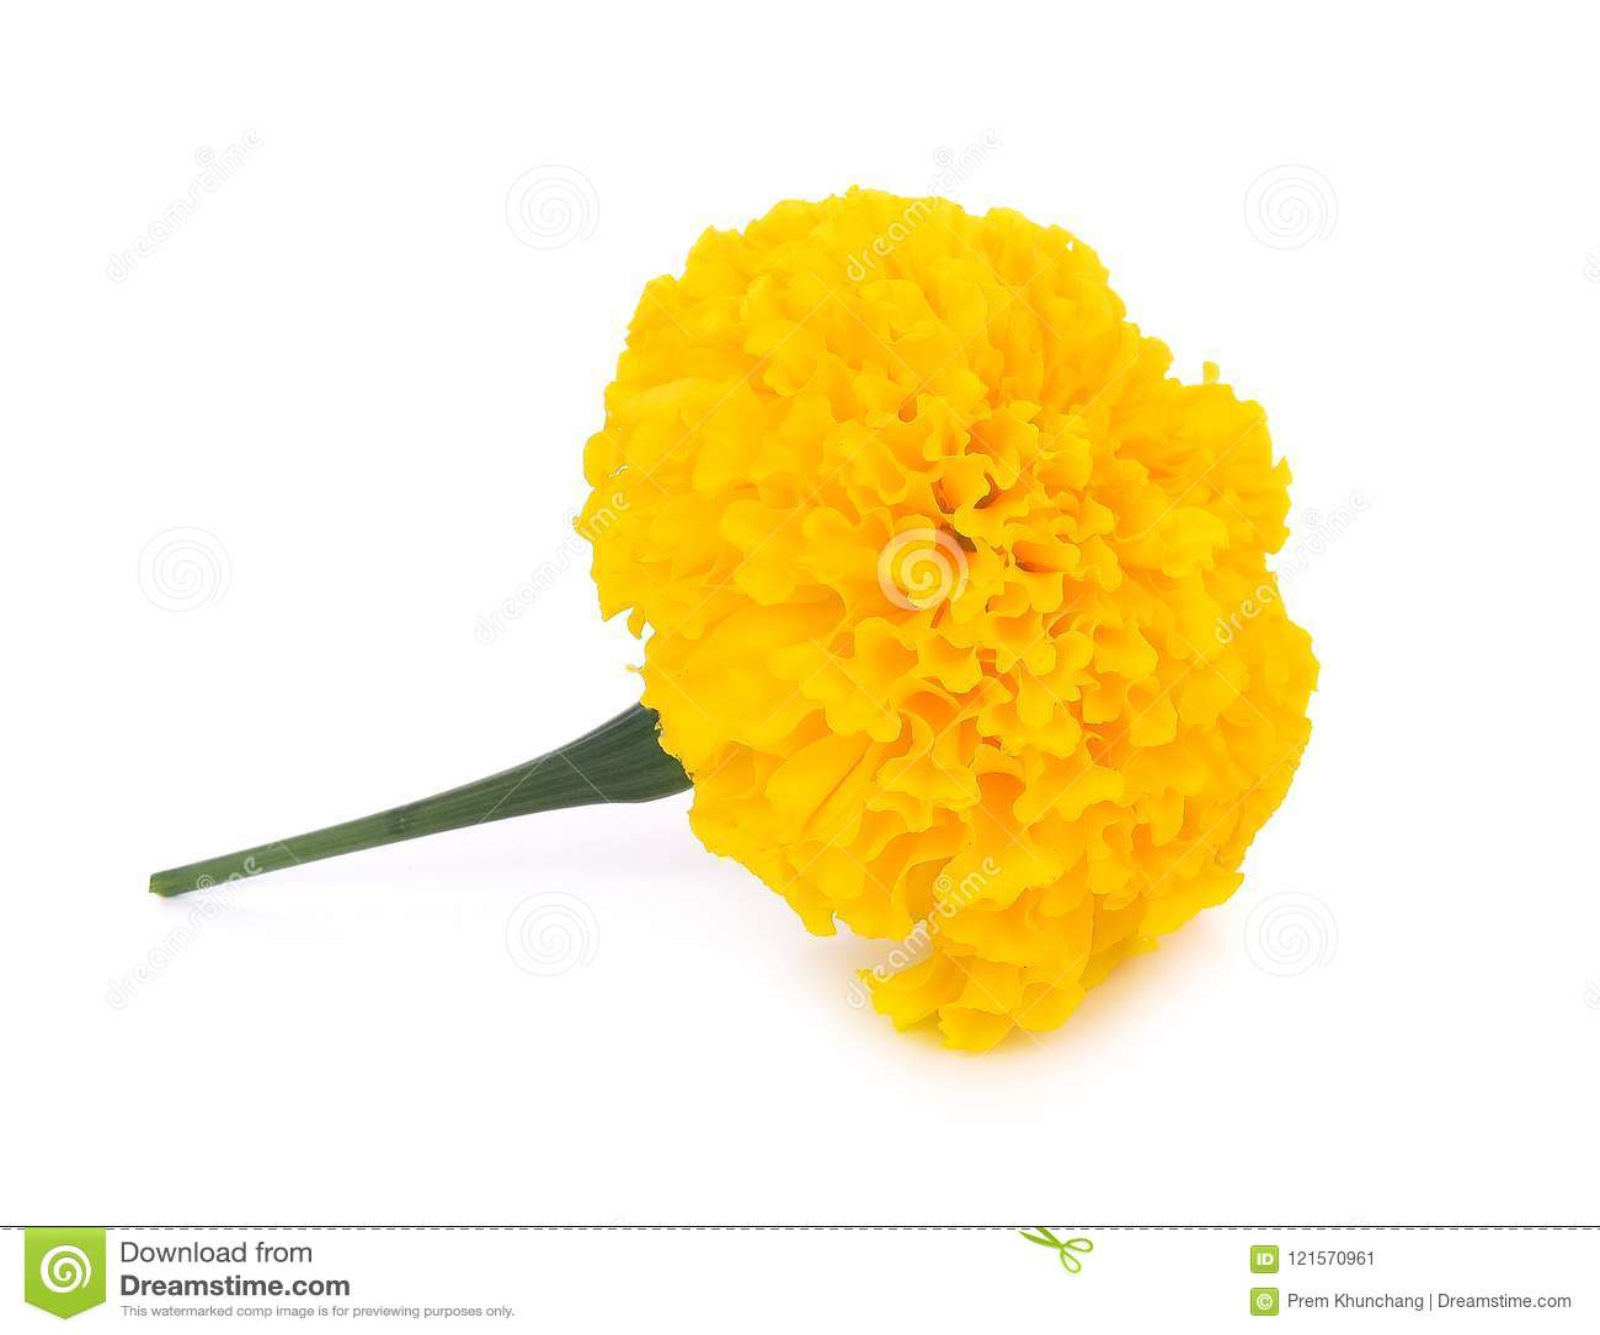 Marigold flowers on white background stock image image of green marigold flowers on white background mightylinksfo